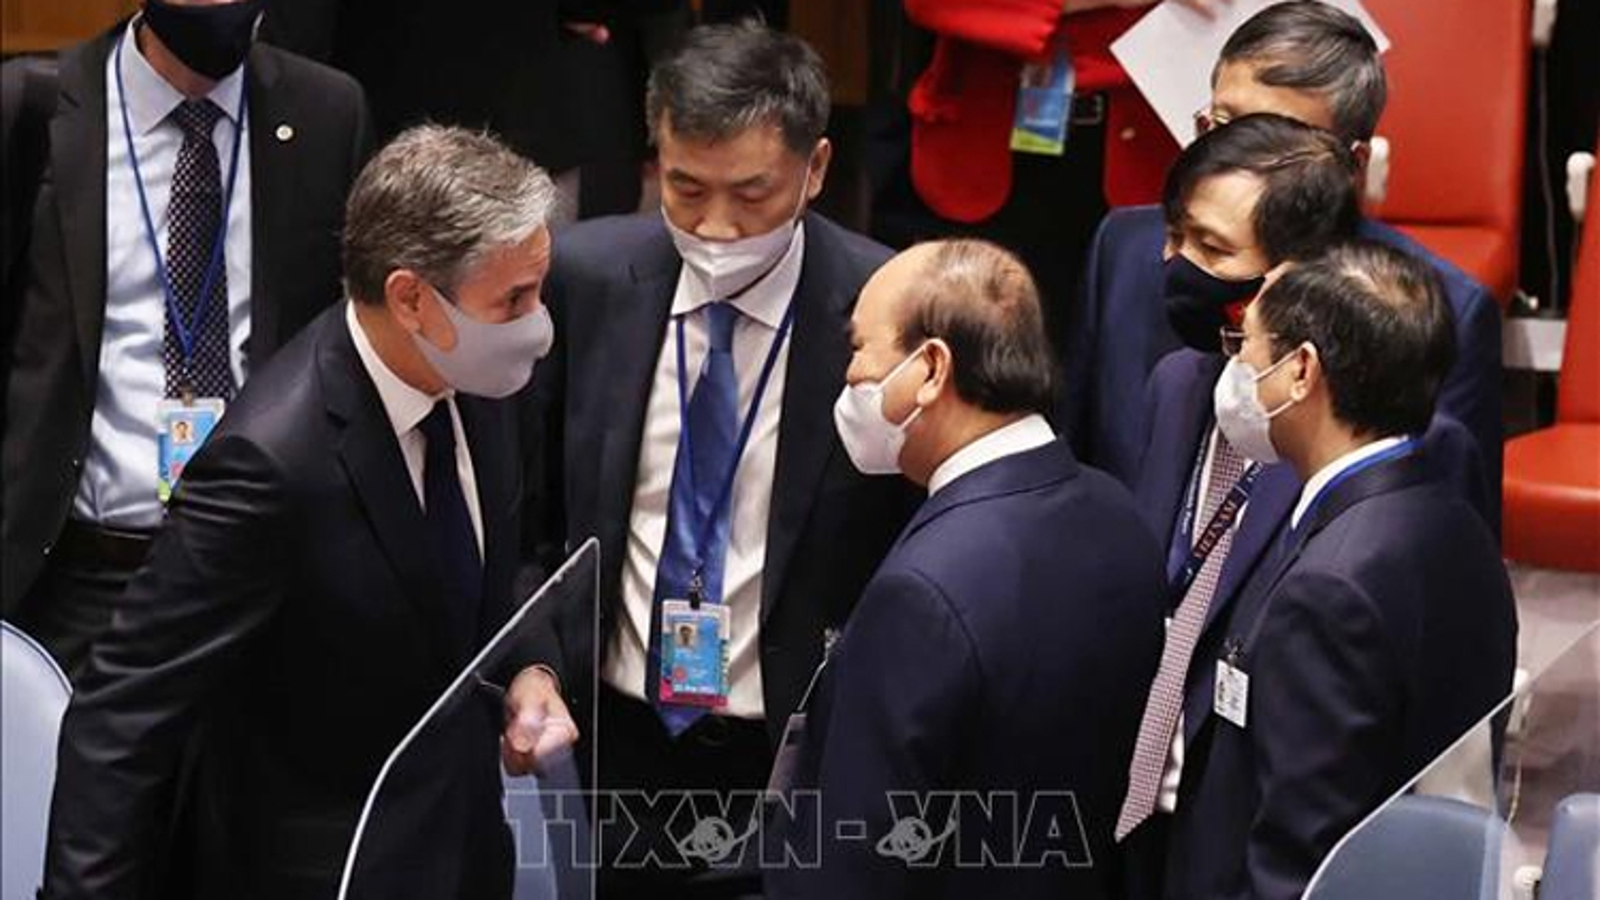 The US is Vietnam's key partner, says President Phuc